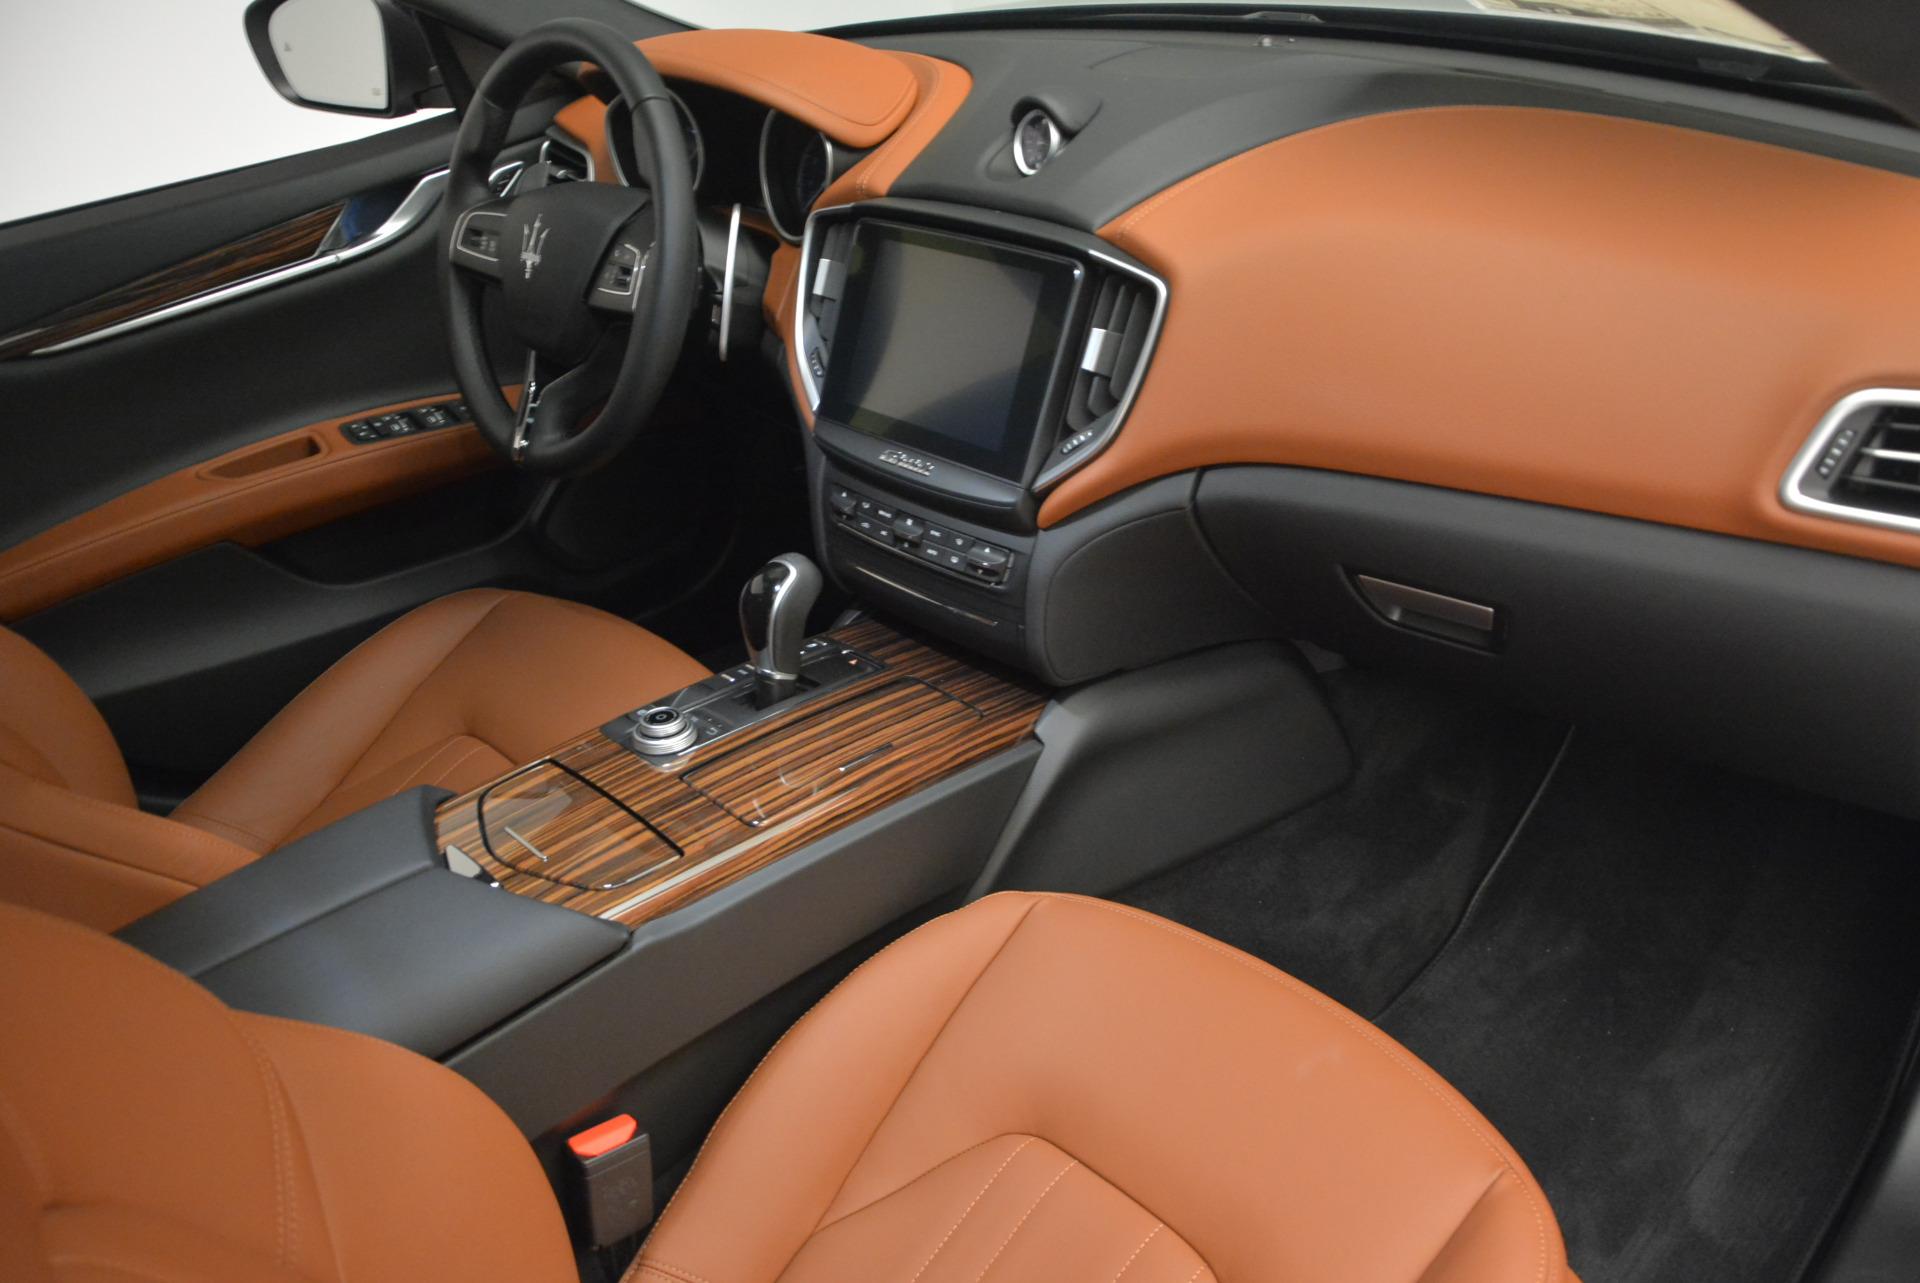 Used 2017 Maserati Ghibli S Q4 - EX Loaner For Sale In Greenwich, CT 568_p19